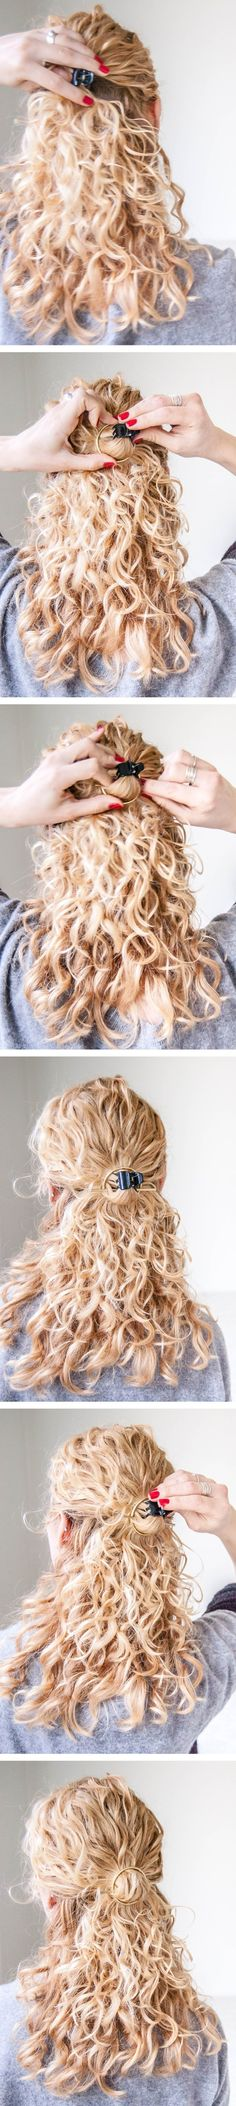 DIY circle hair holder/barrette